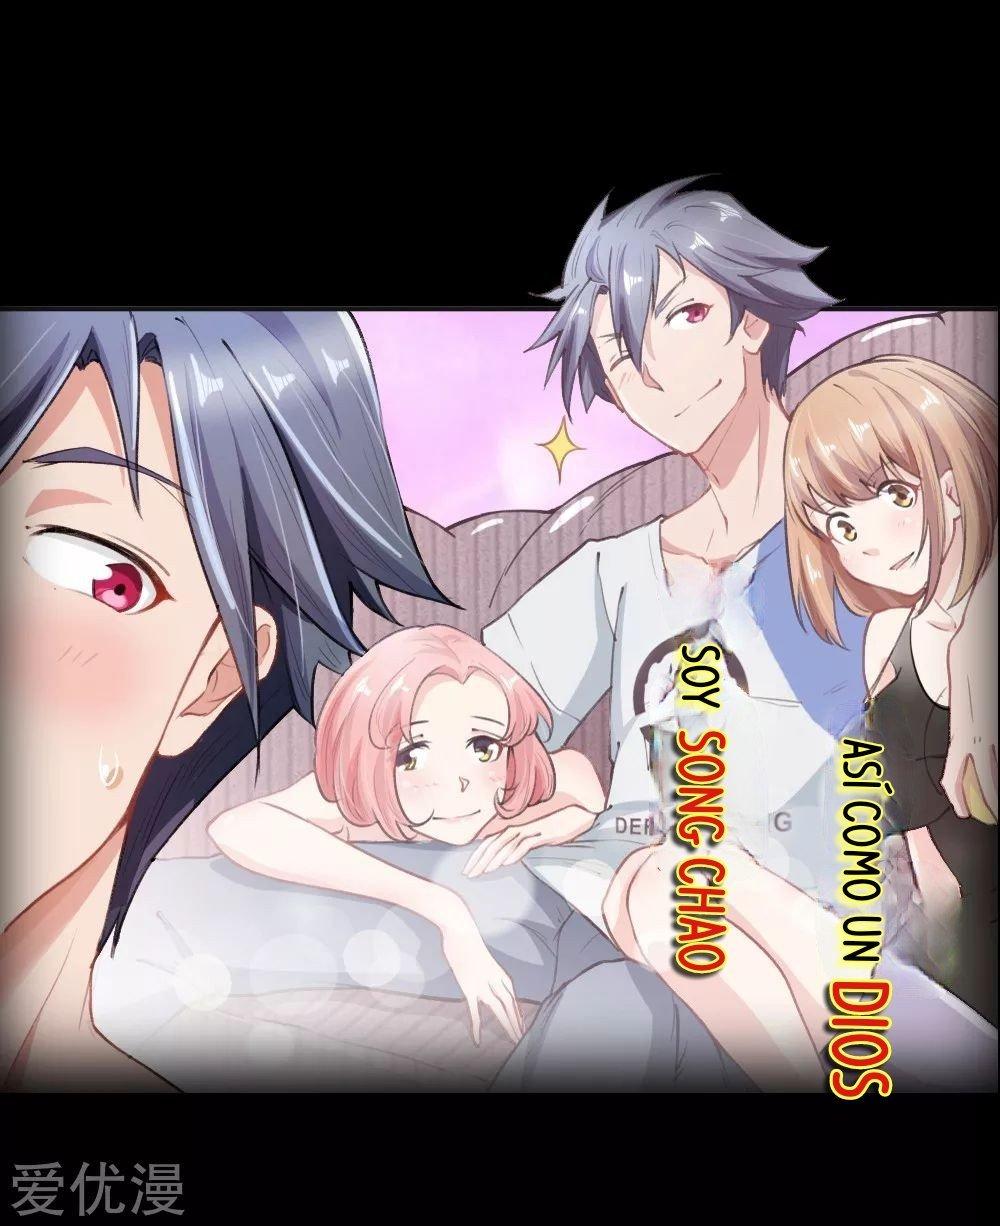 https://nine.mangadogs.com/es_manga/pic8/58/36666/946503/4f3d7d38d24b740c95da2b03dc3a2333.jpg Page 8